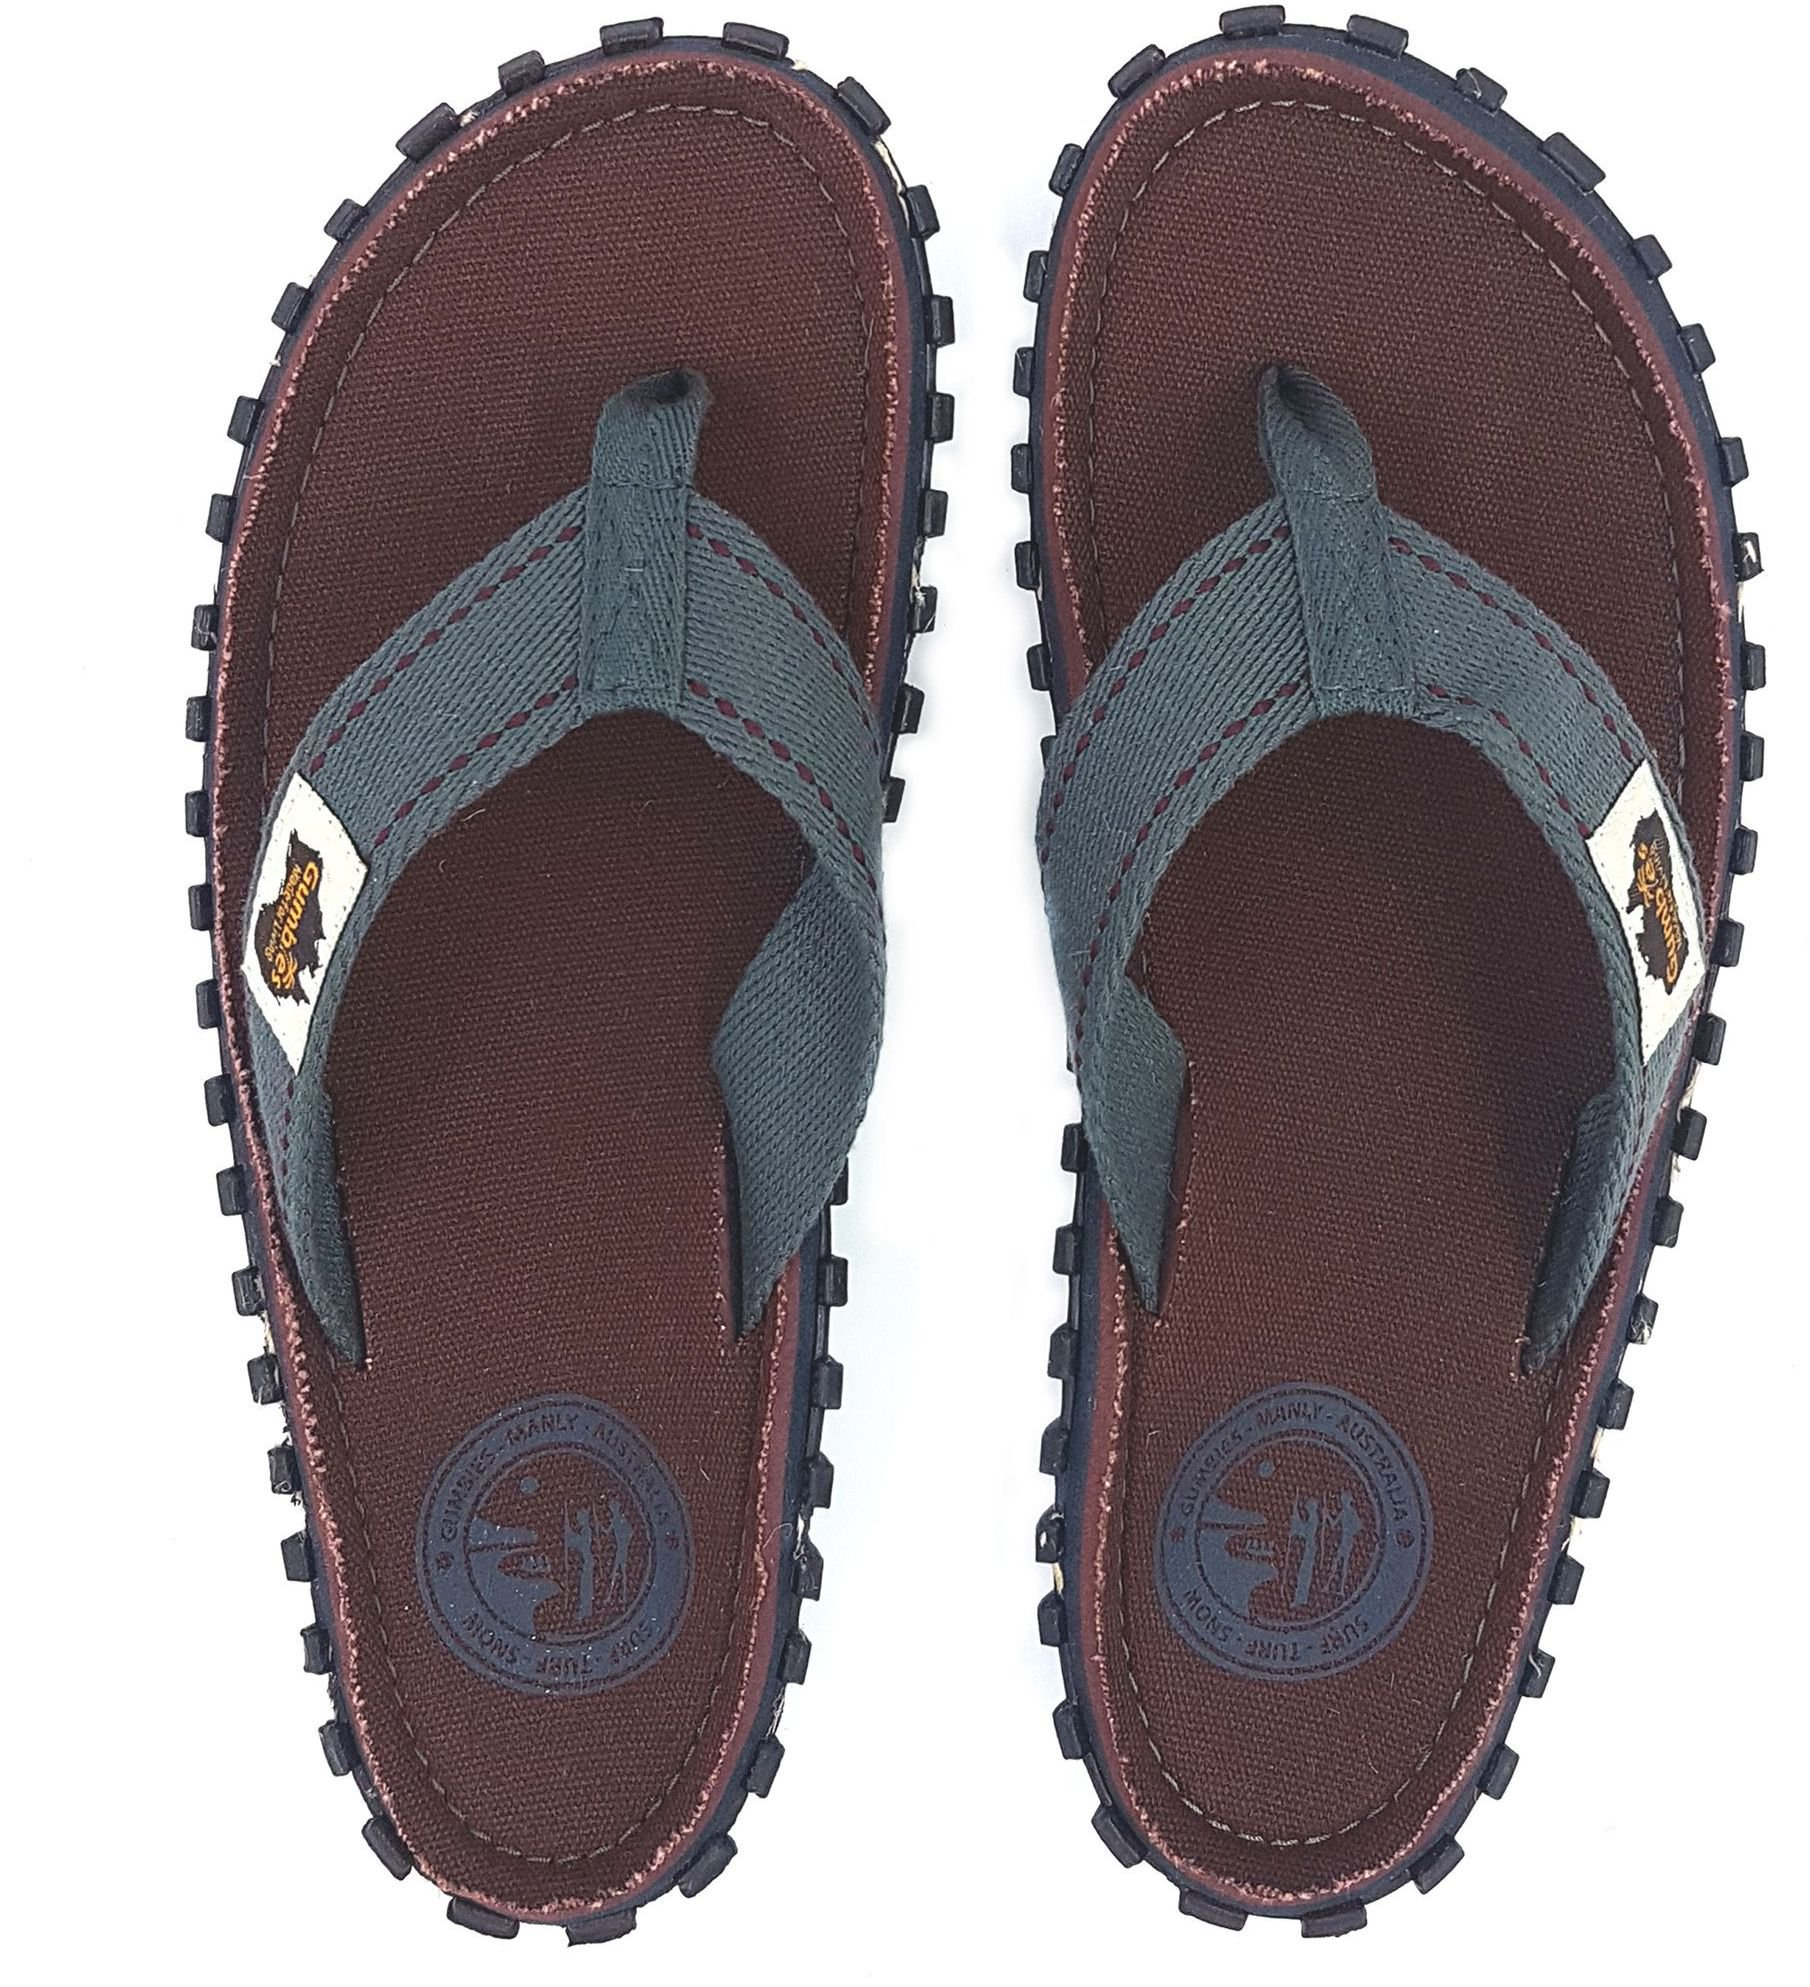 Gumbies  Japonki meskie Gumbies Islander Canvas Flip-Flops Men Manly r. 41 4009300